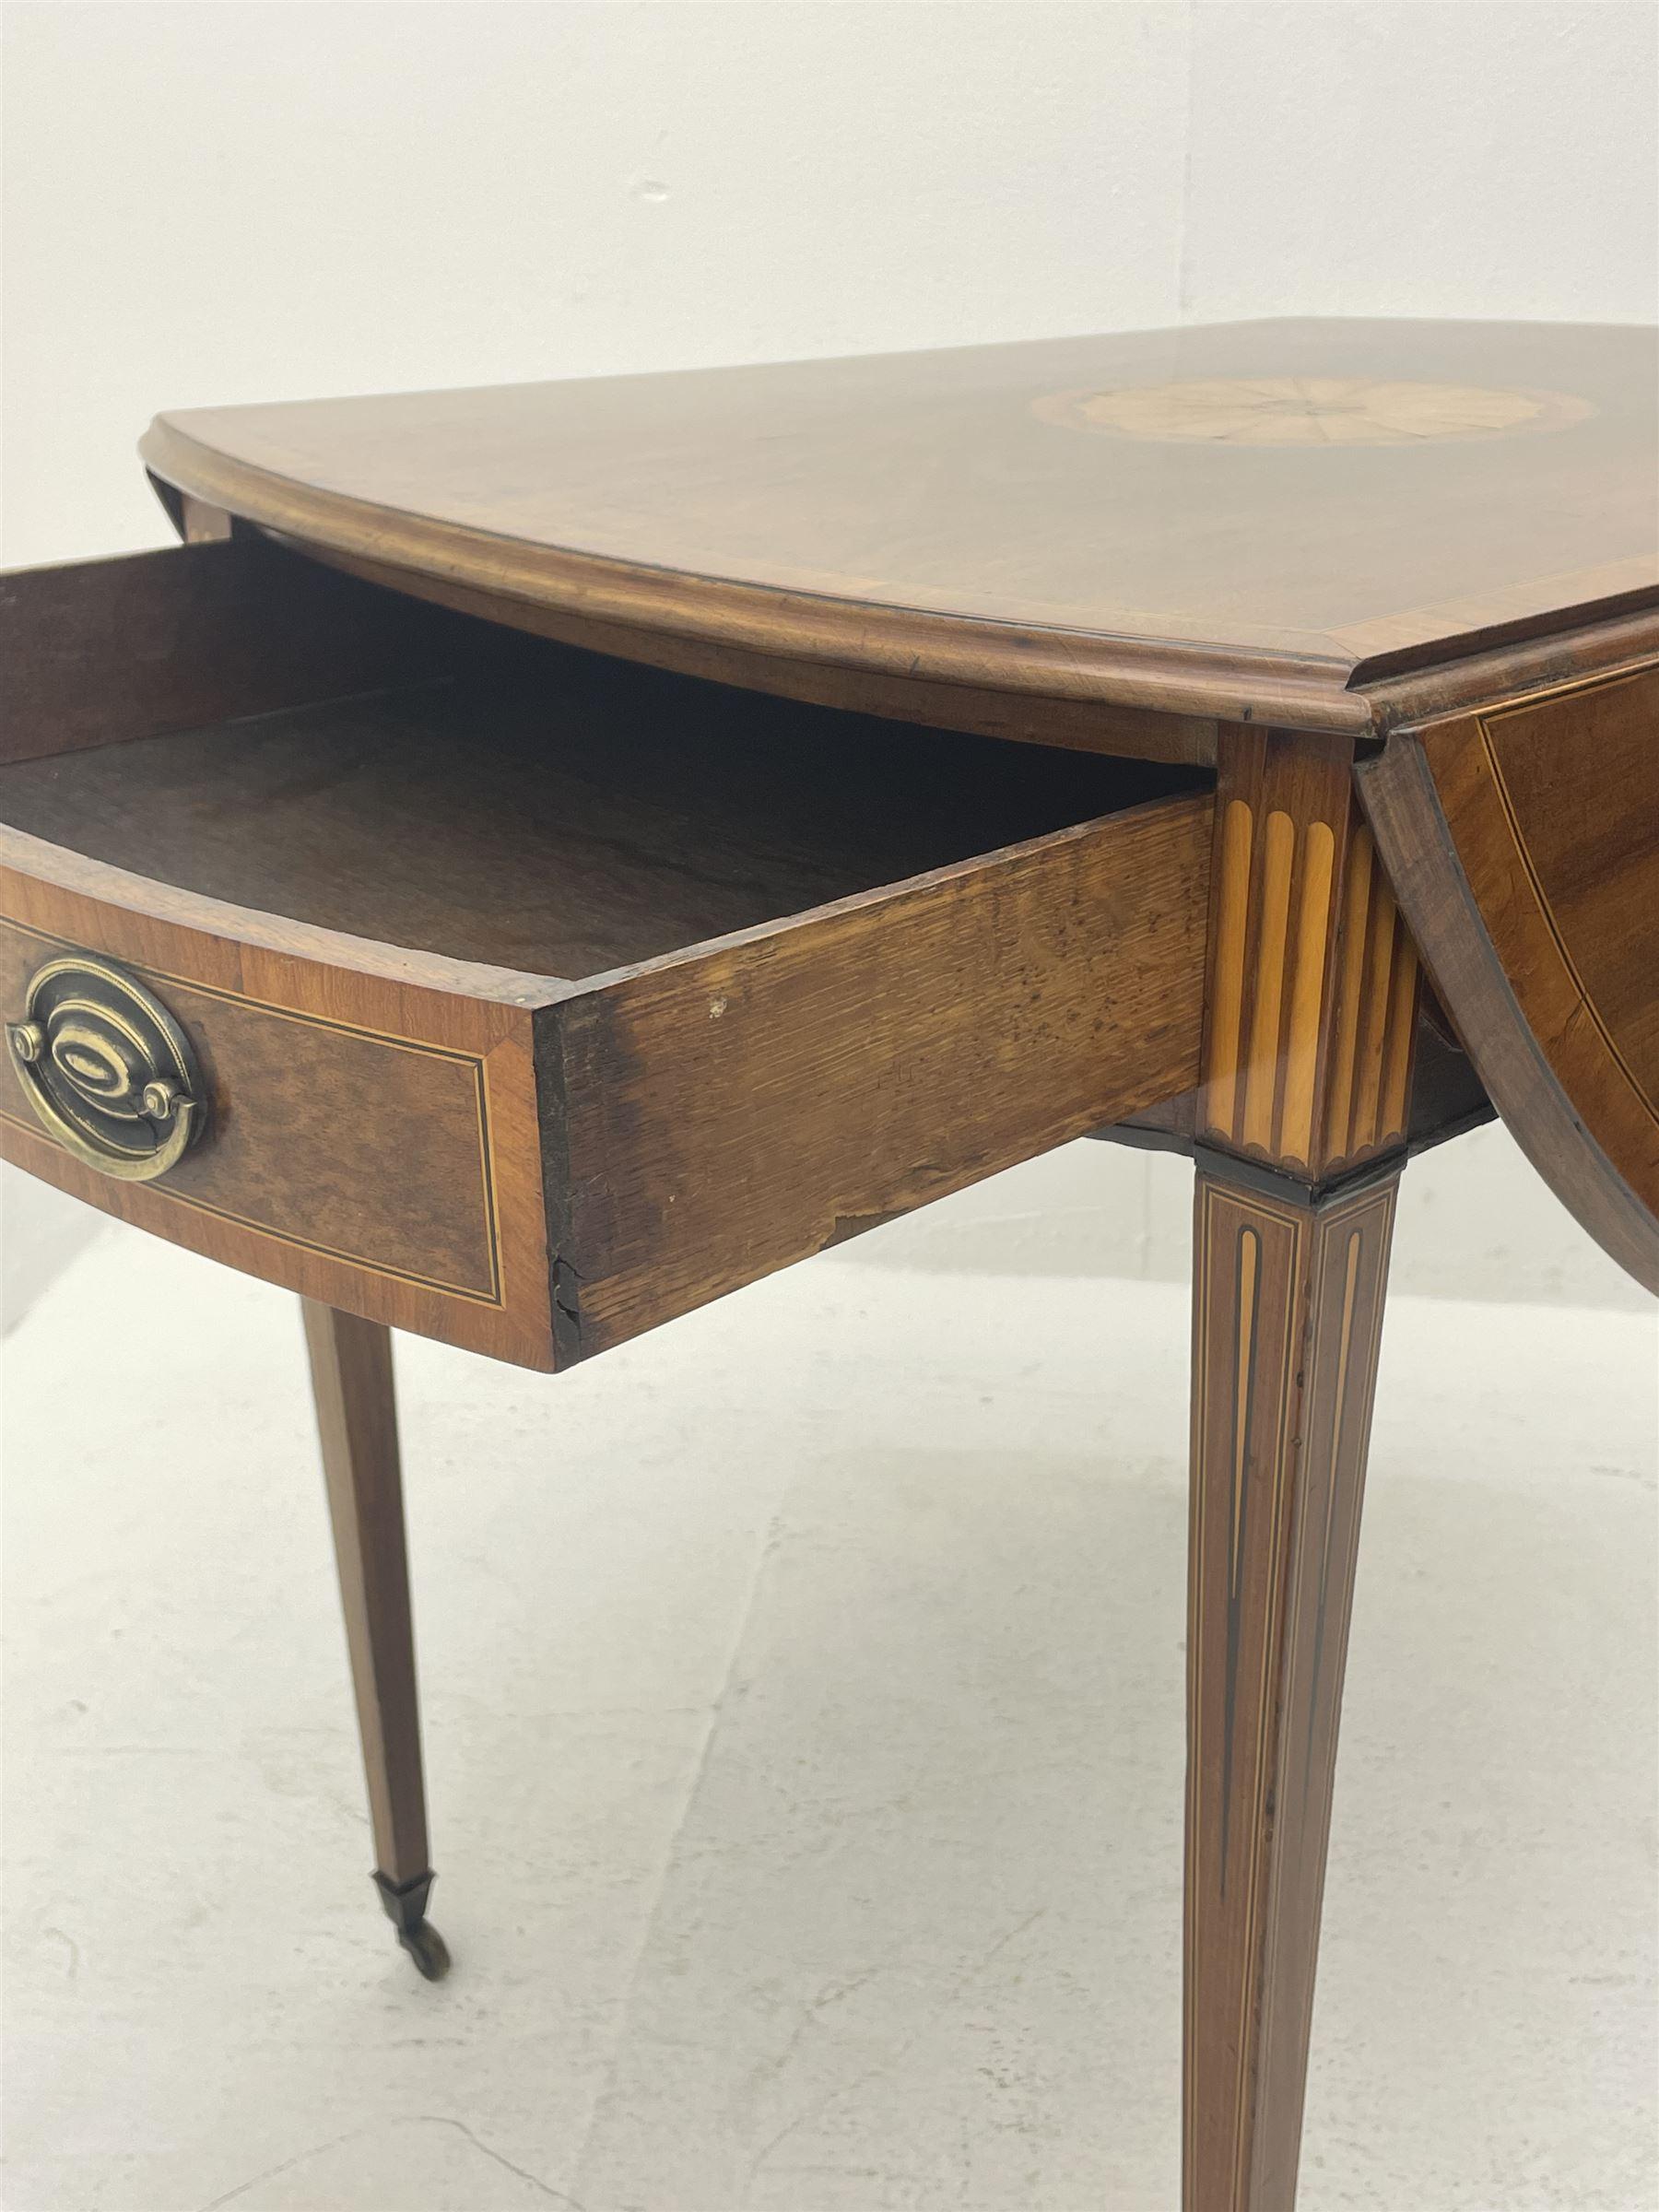 Sheraton period mahogany Pembroke table - Image 4 of 8